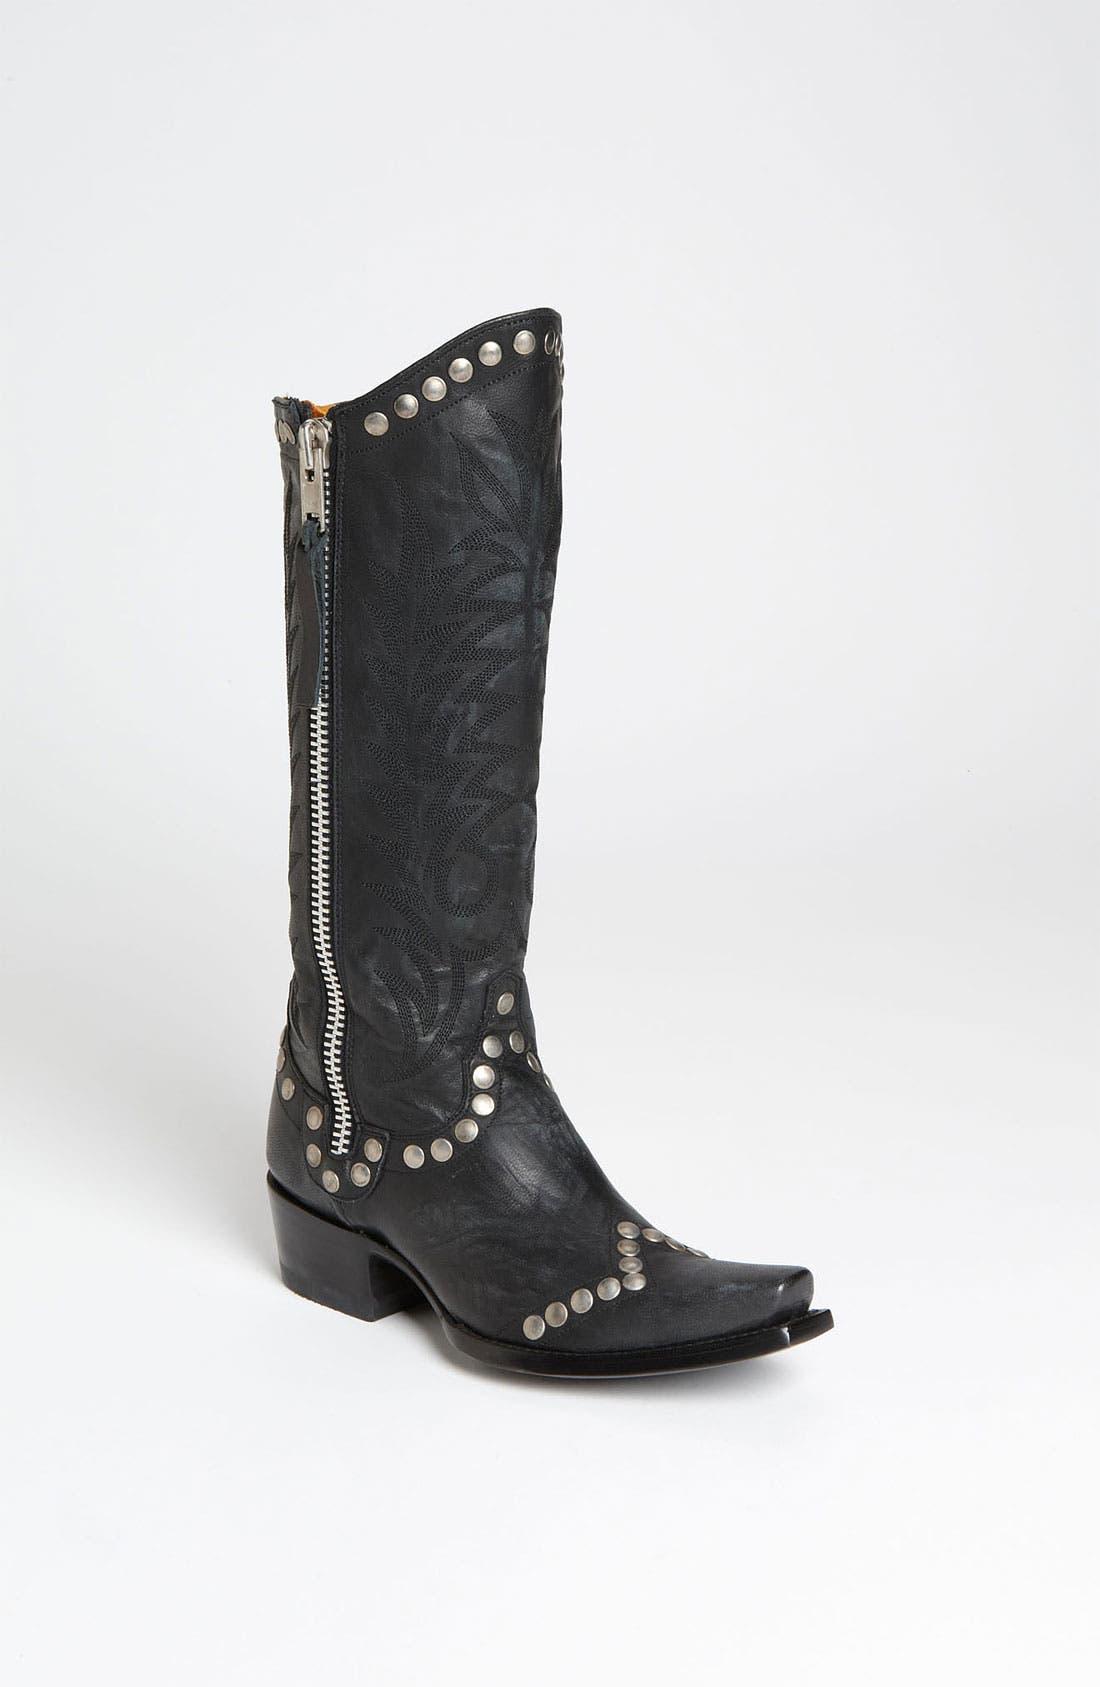 Alternate Image 1 Selected - Old Gringo 'Rockrazz' Boot